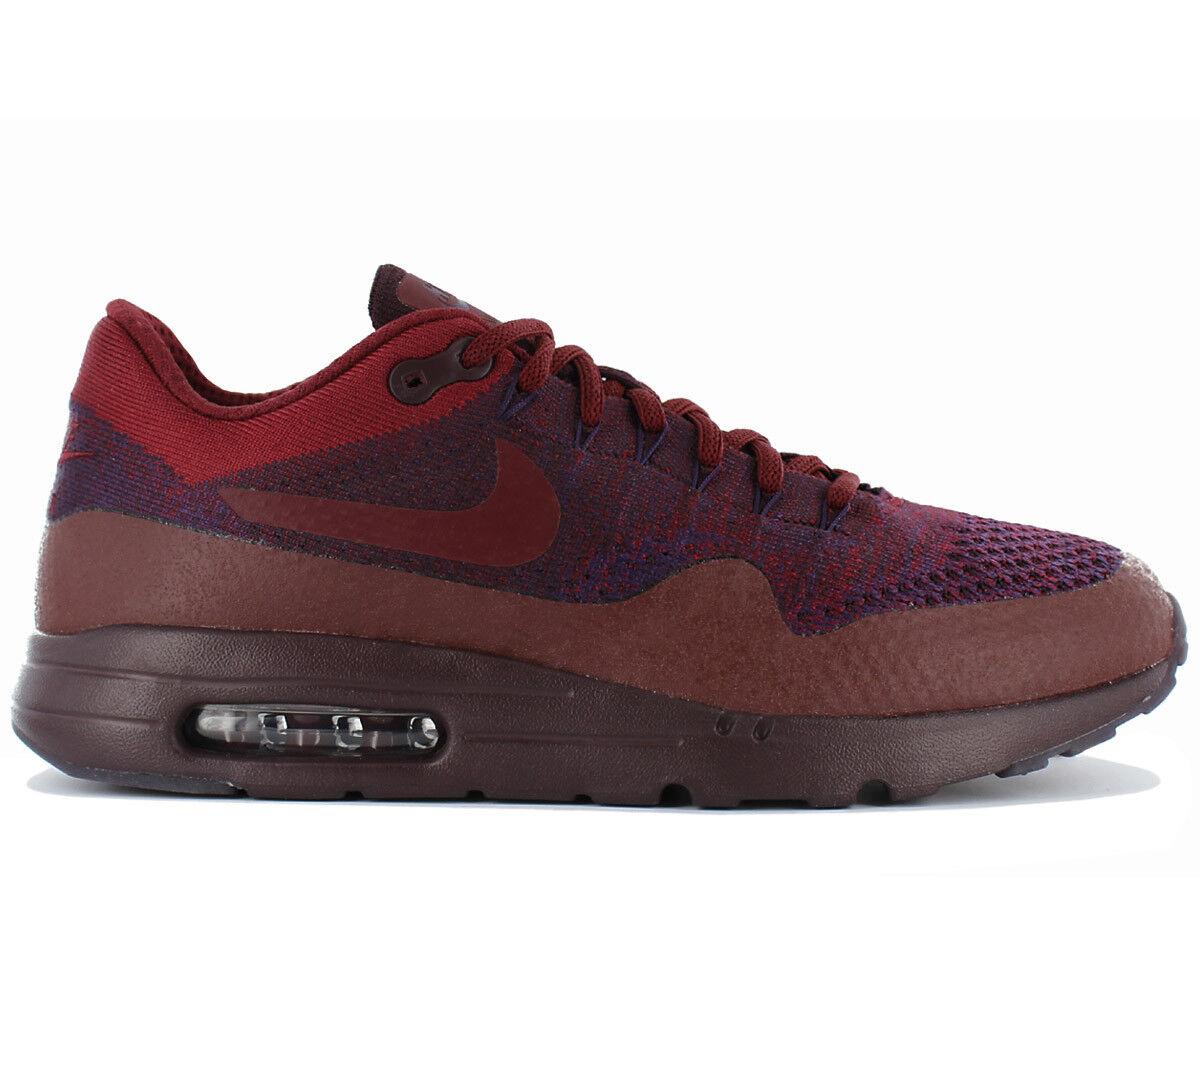 reputable site dd0c8 81f6d ... Nike AIR MAX Herren Herren Herren Turnschuhe Schuhe Turnschuhe Classic  BW 90 1 95 Tavas Command ...